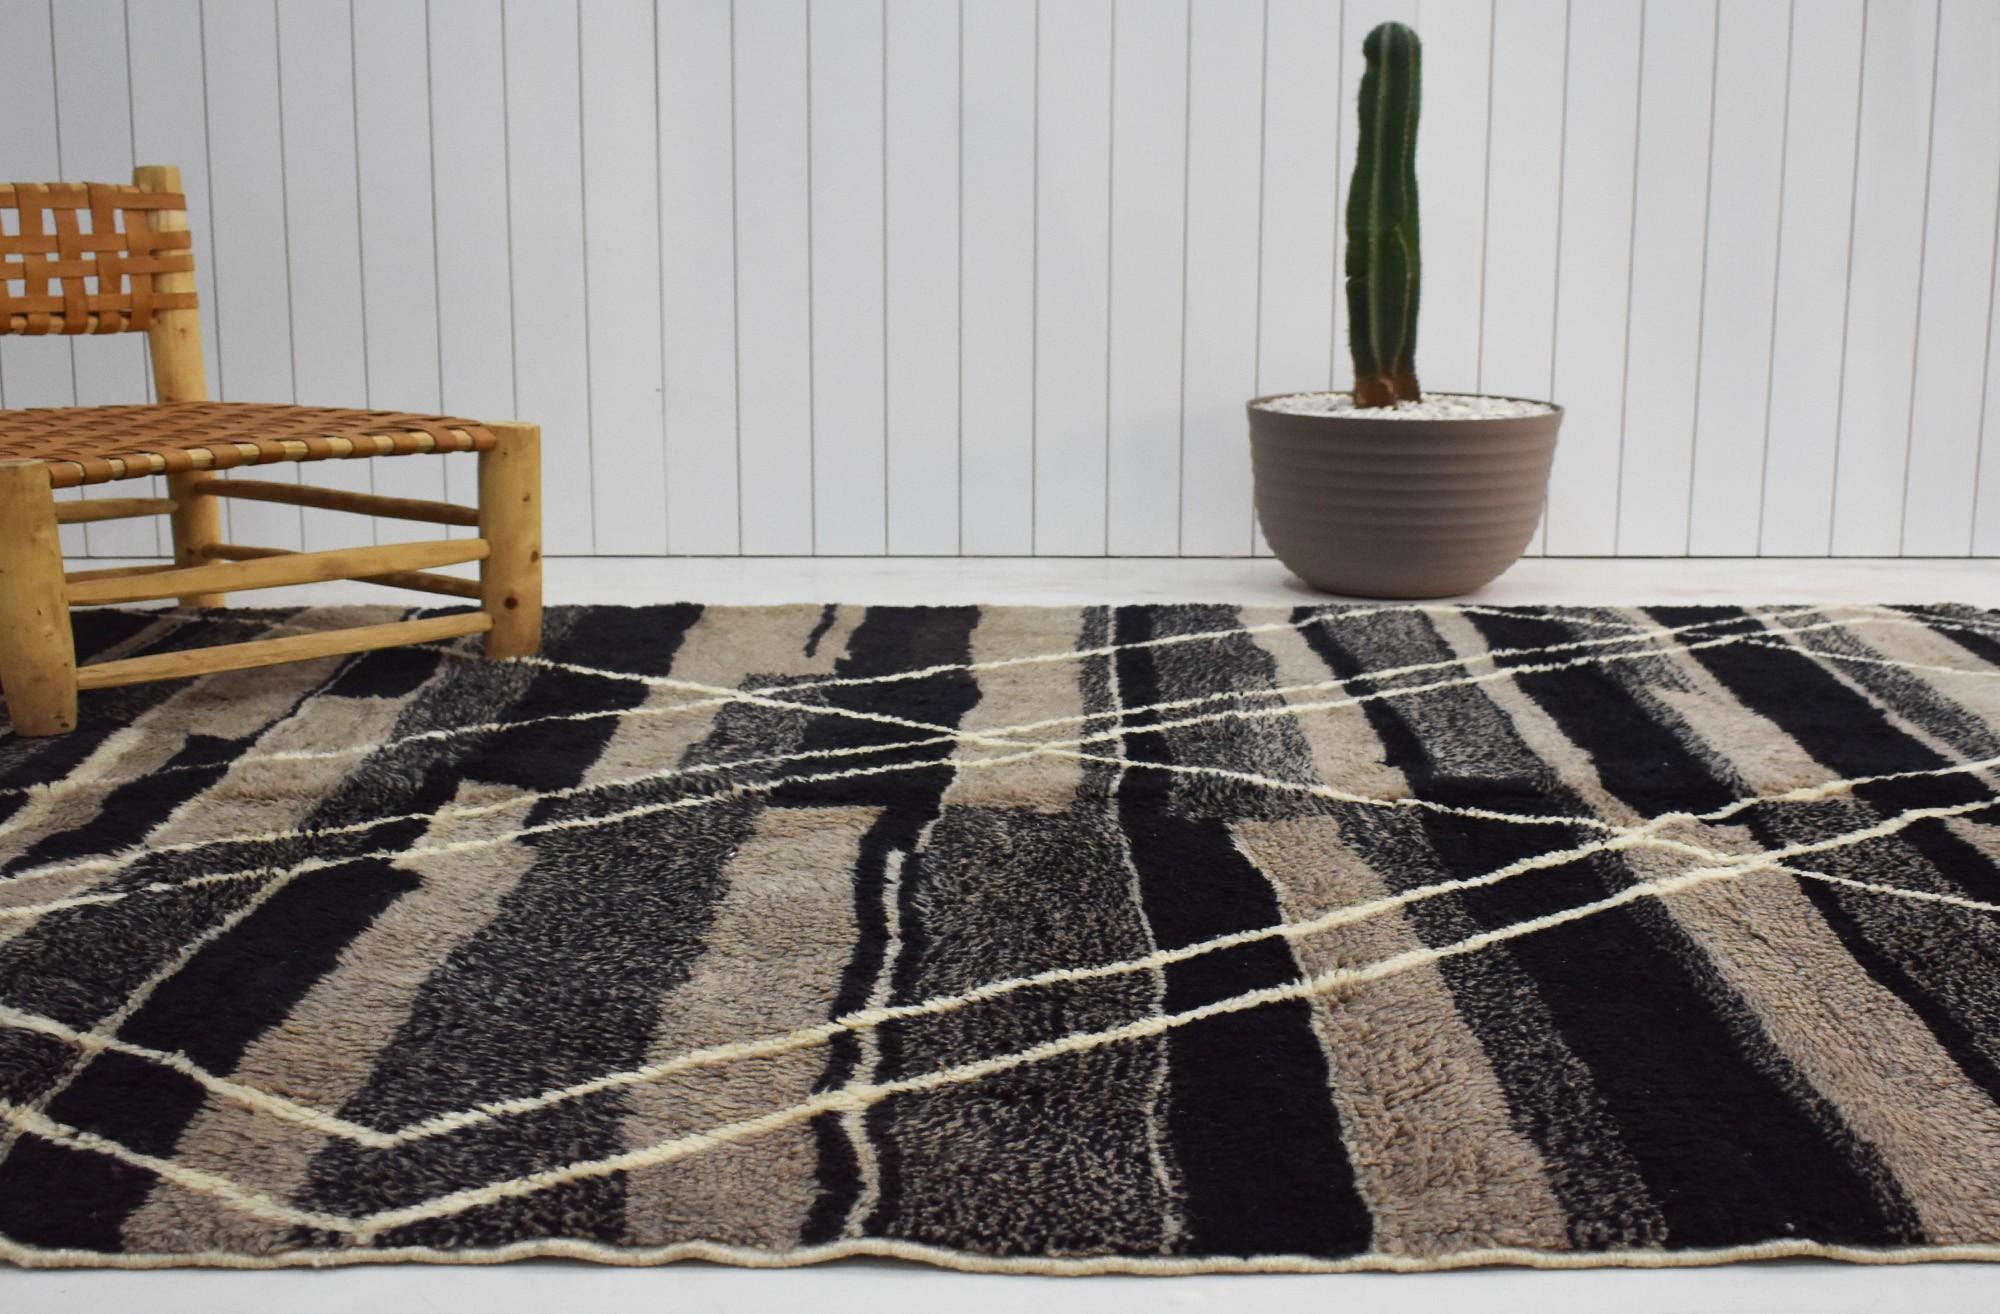 Berber carpet black, beige and gray